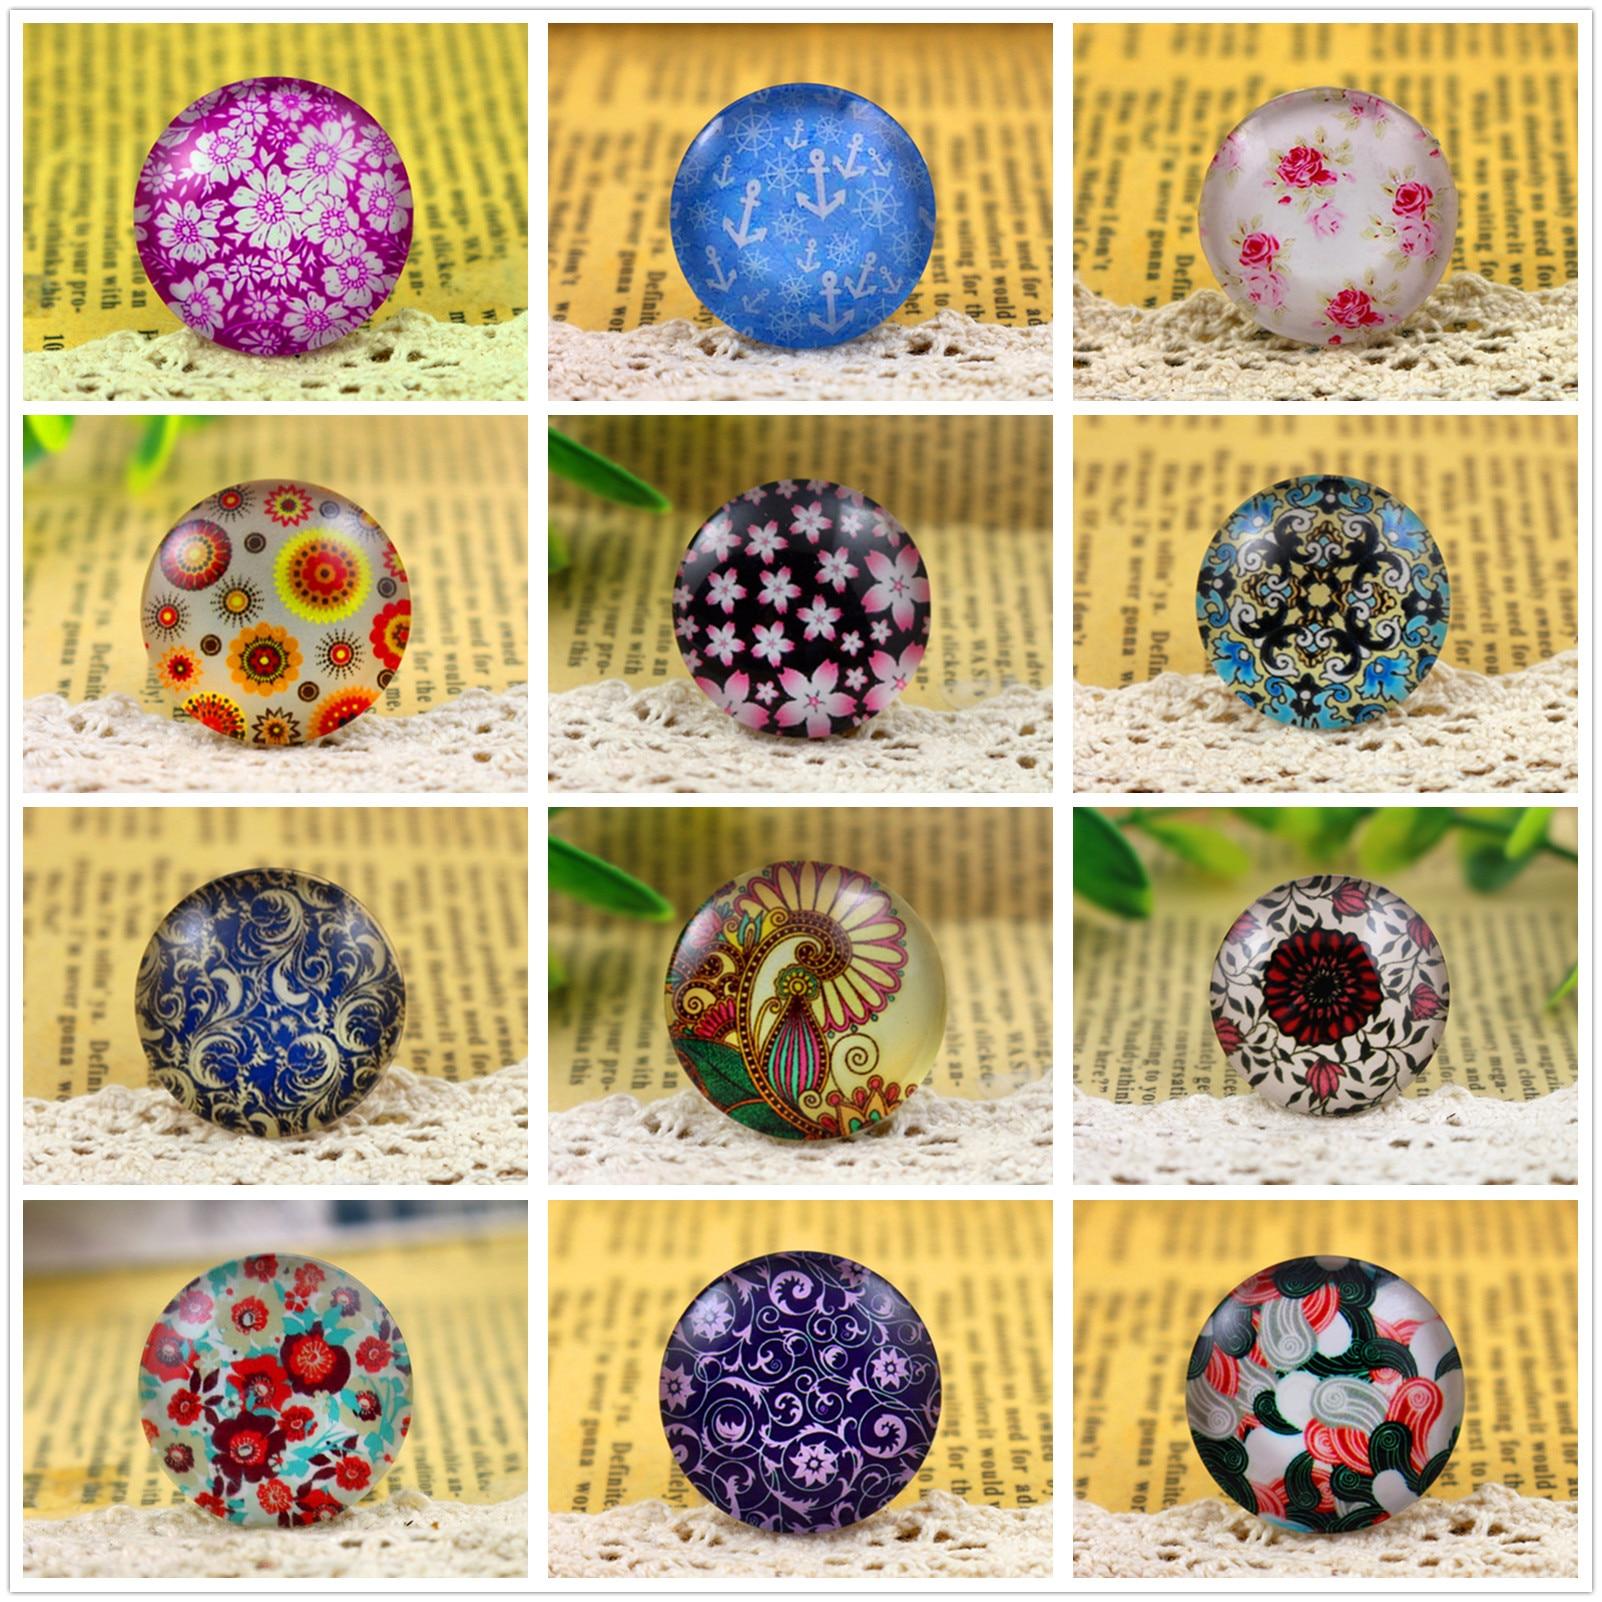 Hot Sale 5pcs/Lot 25mm Handmade Photo Glass Cabochons (Color Patterns)